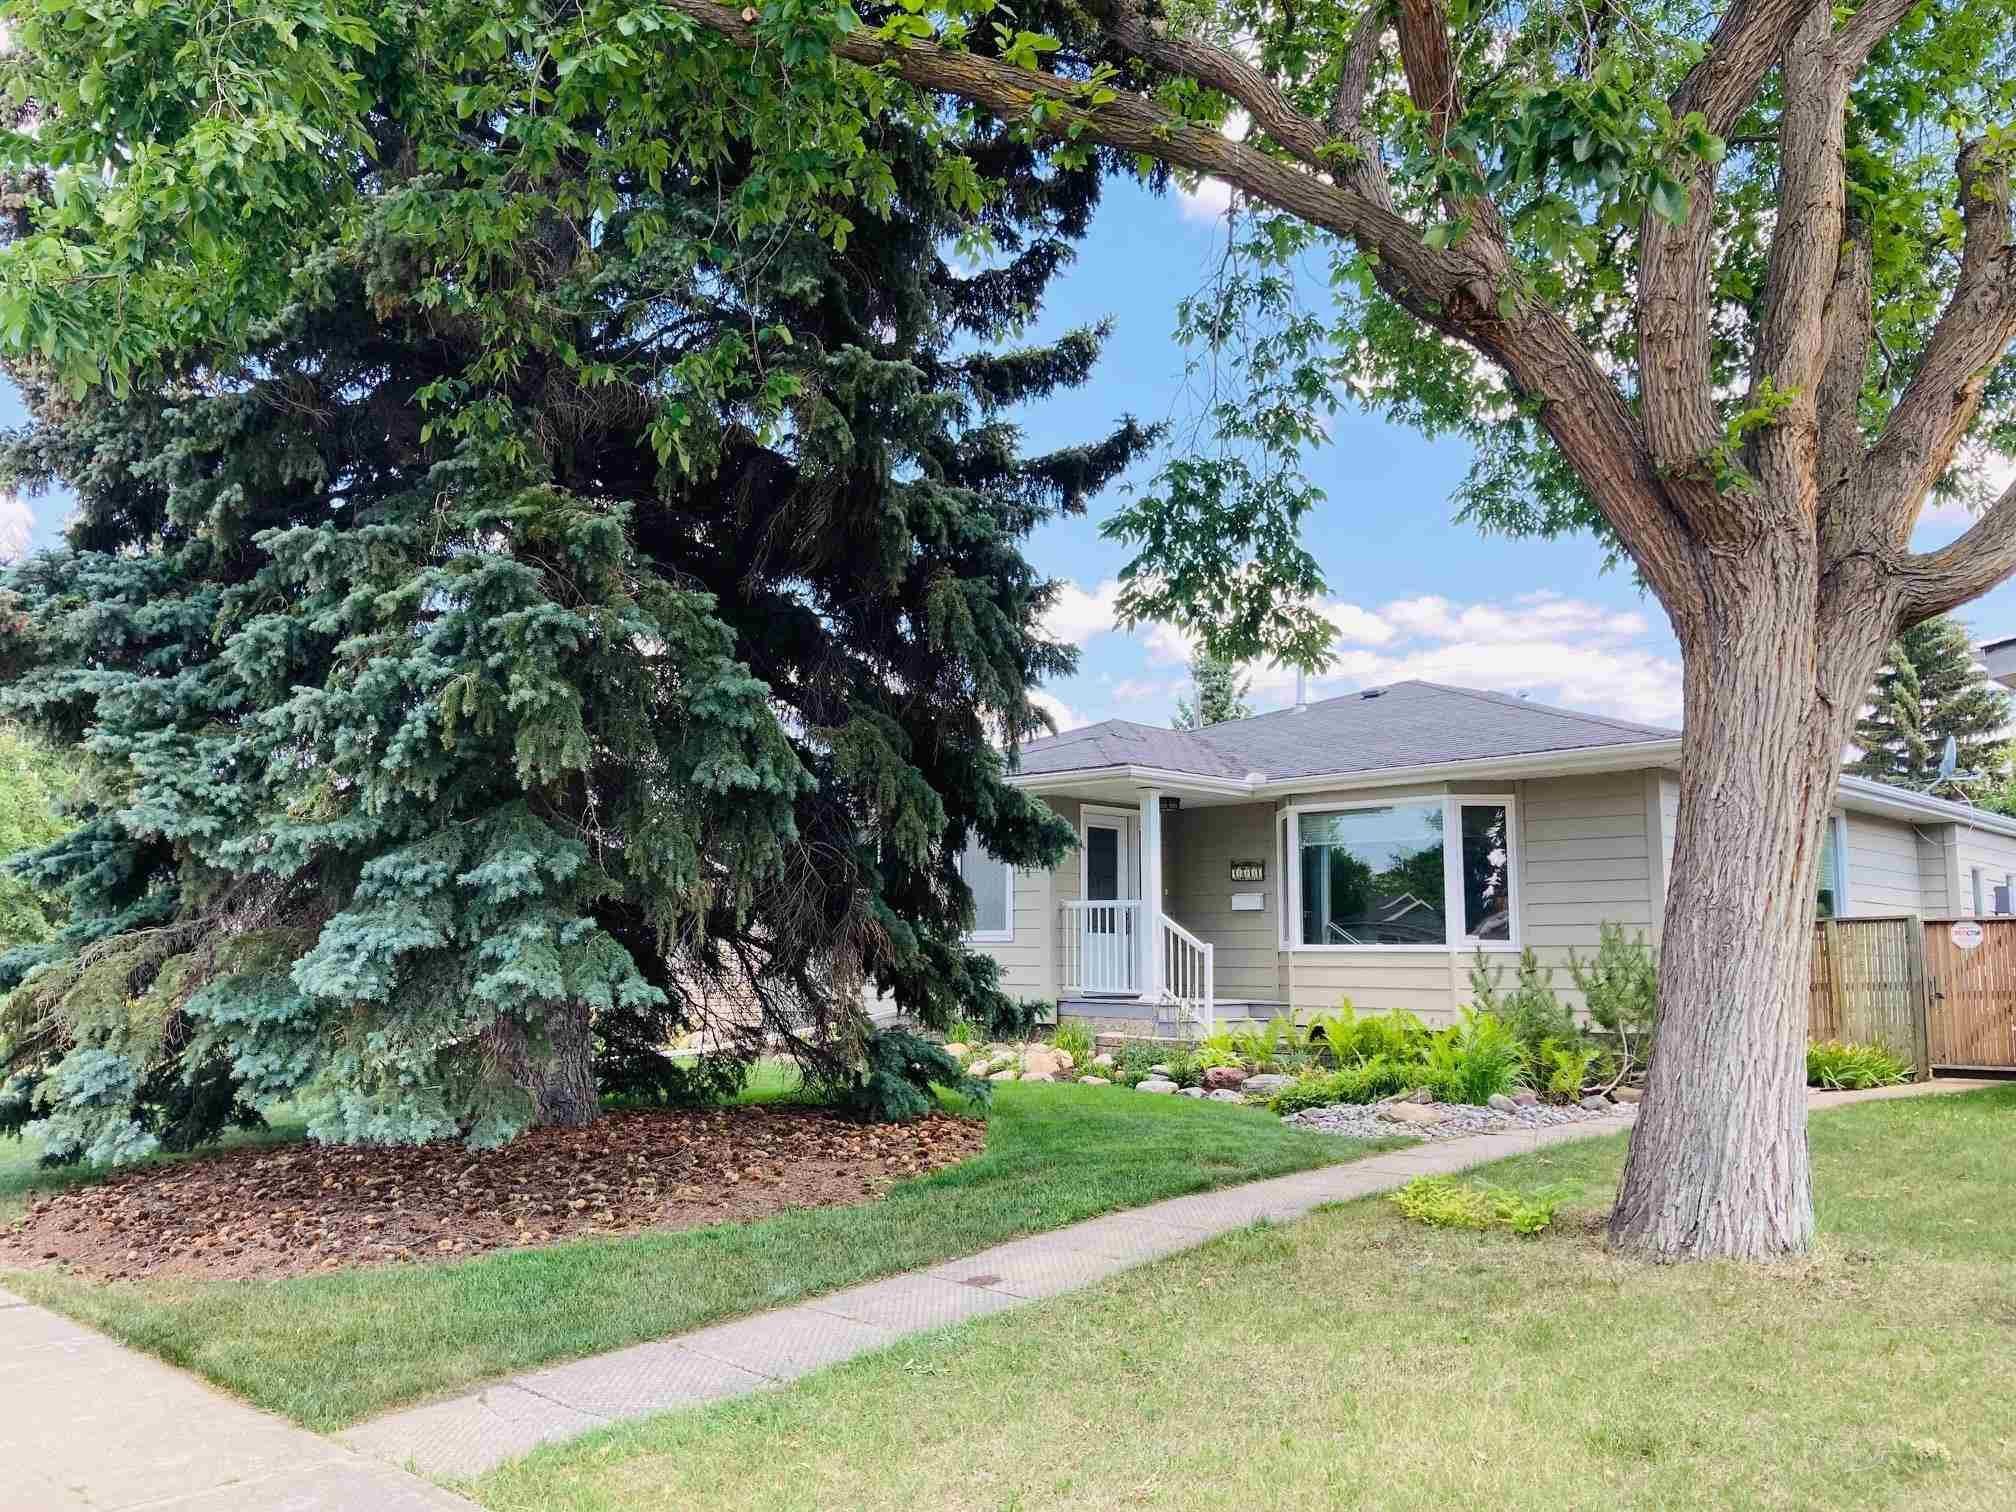 Main Photo: 4811 114B Street in Edmonton: Zone 15 House for sale : MLS®# E4255022